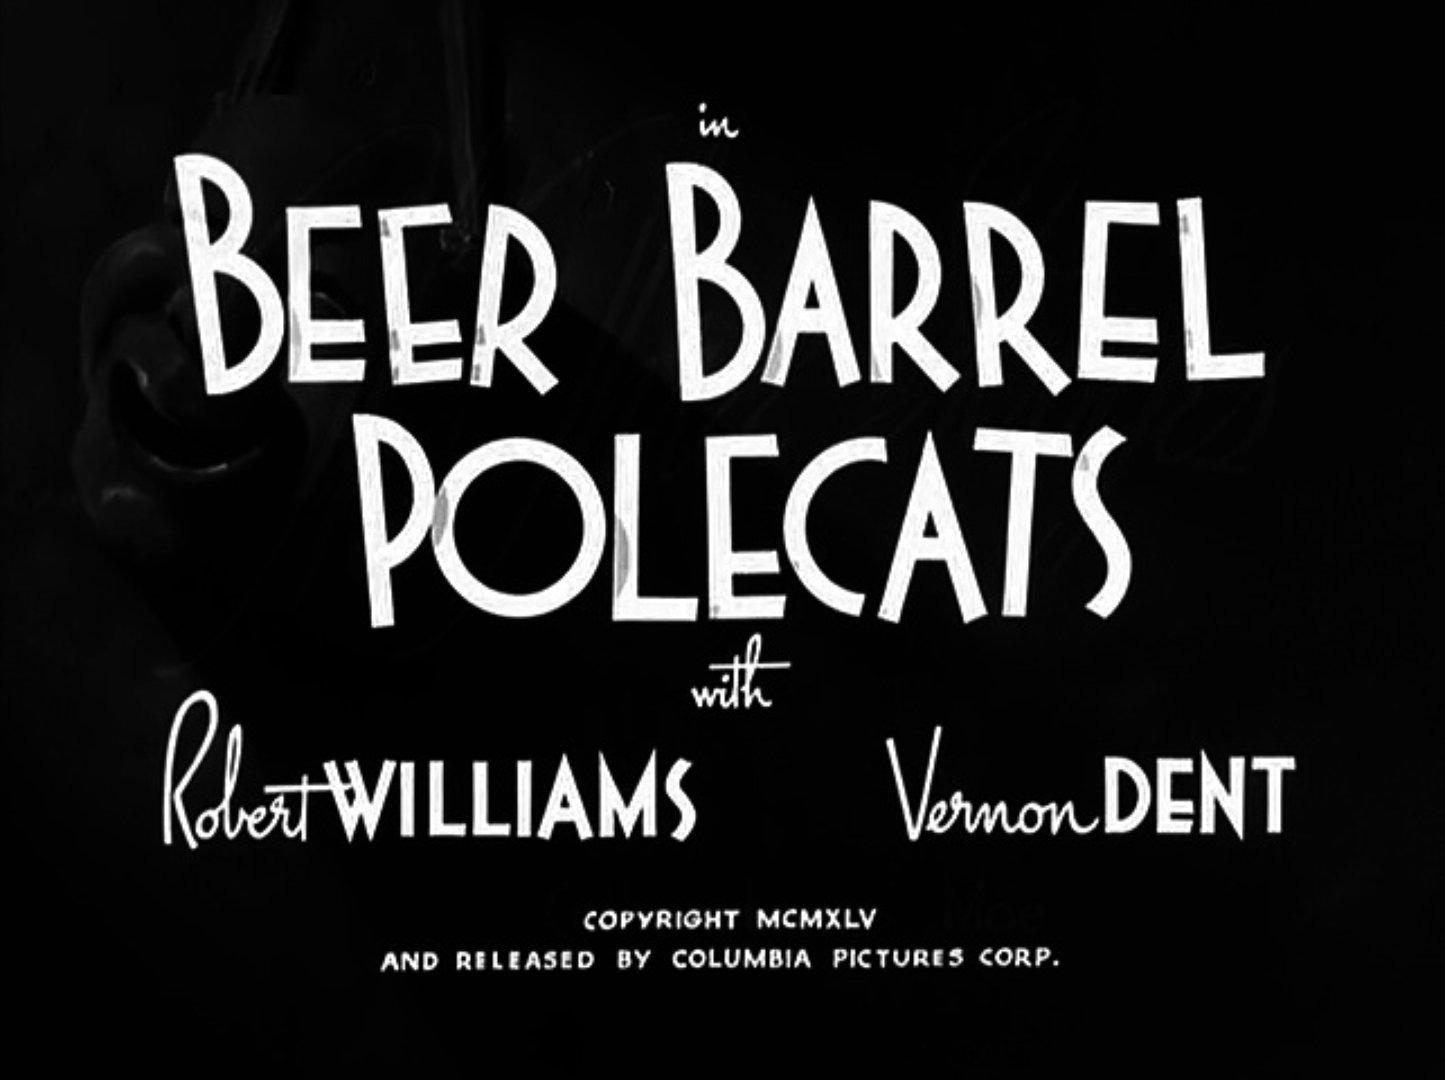 Image result for The Three Stooges: Beer Barrel Polecats (1946)